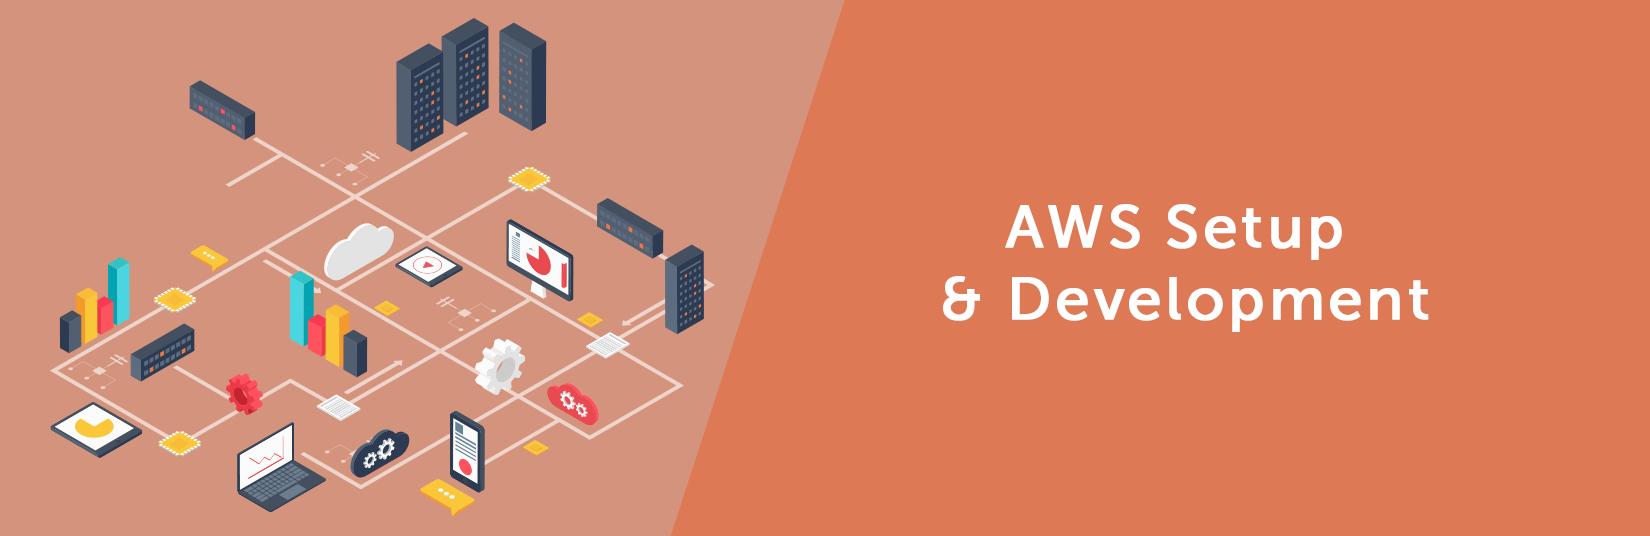 AWS (Amazon Web Service Development) Setup & Development